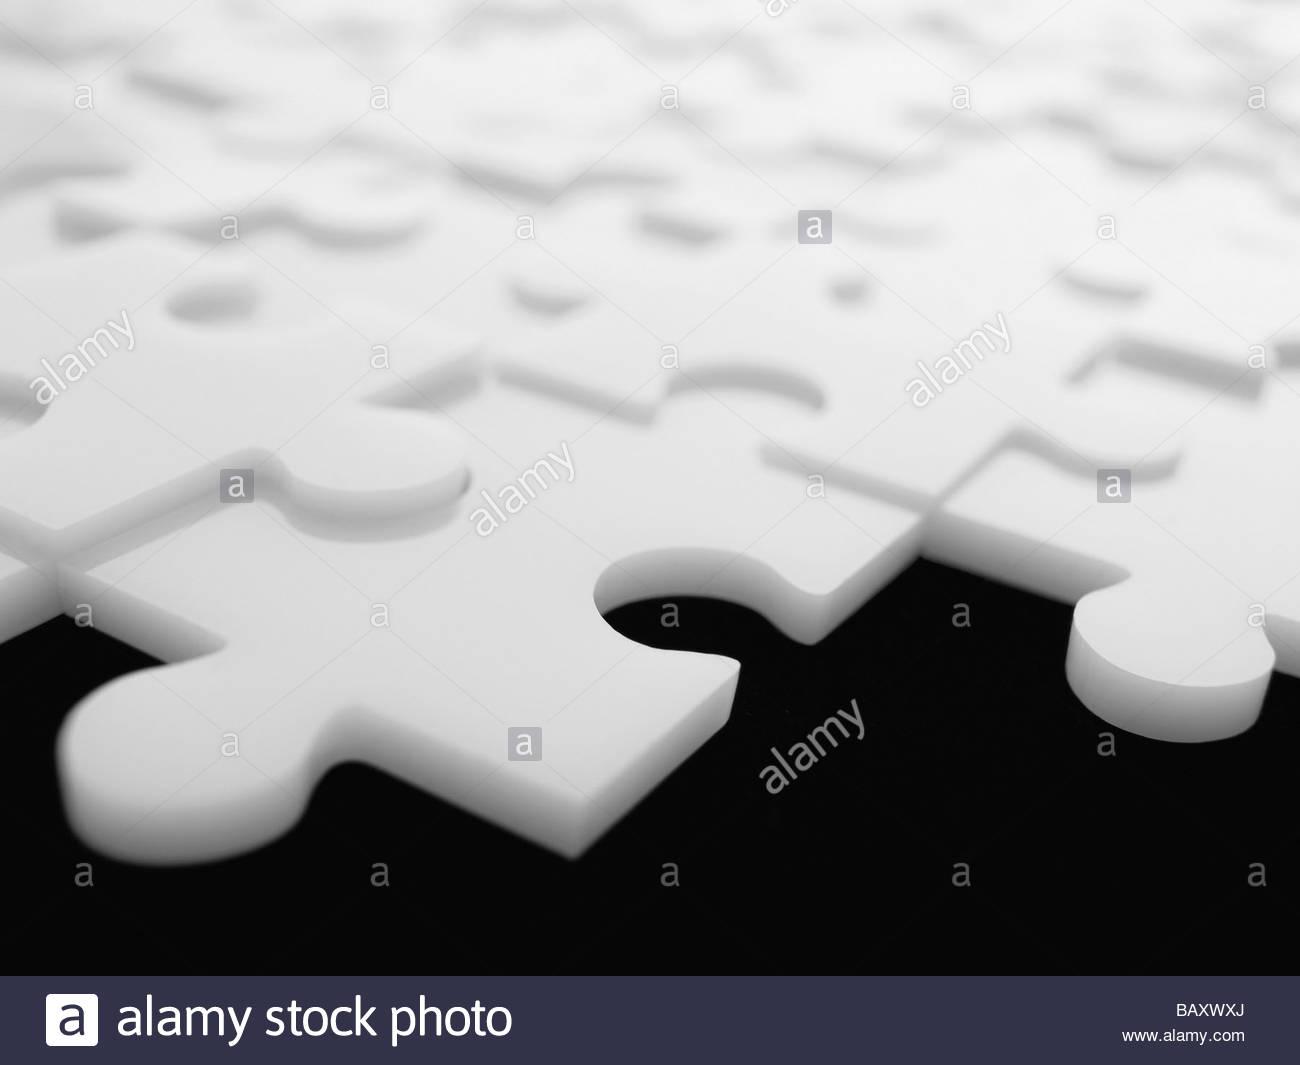 Interlocking puzzle pieces - Stock Image